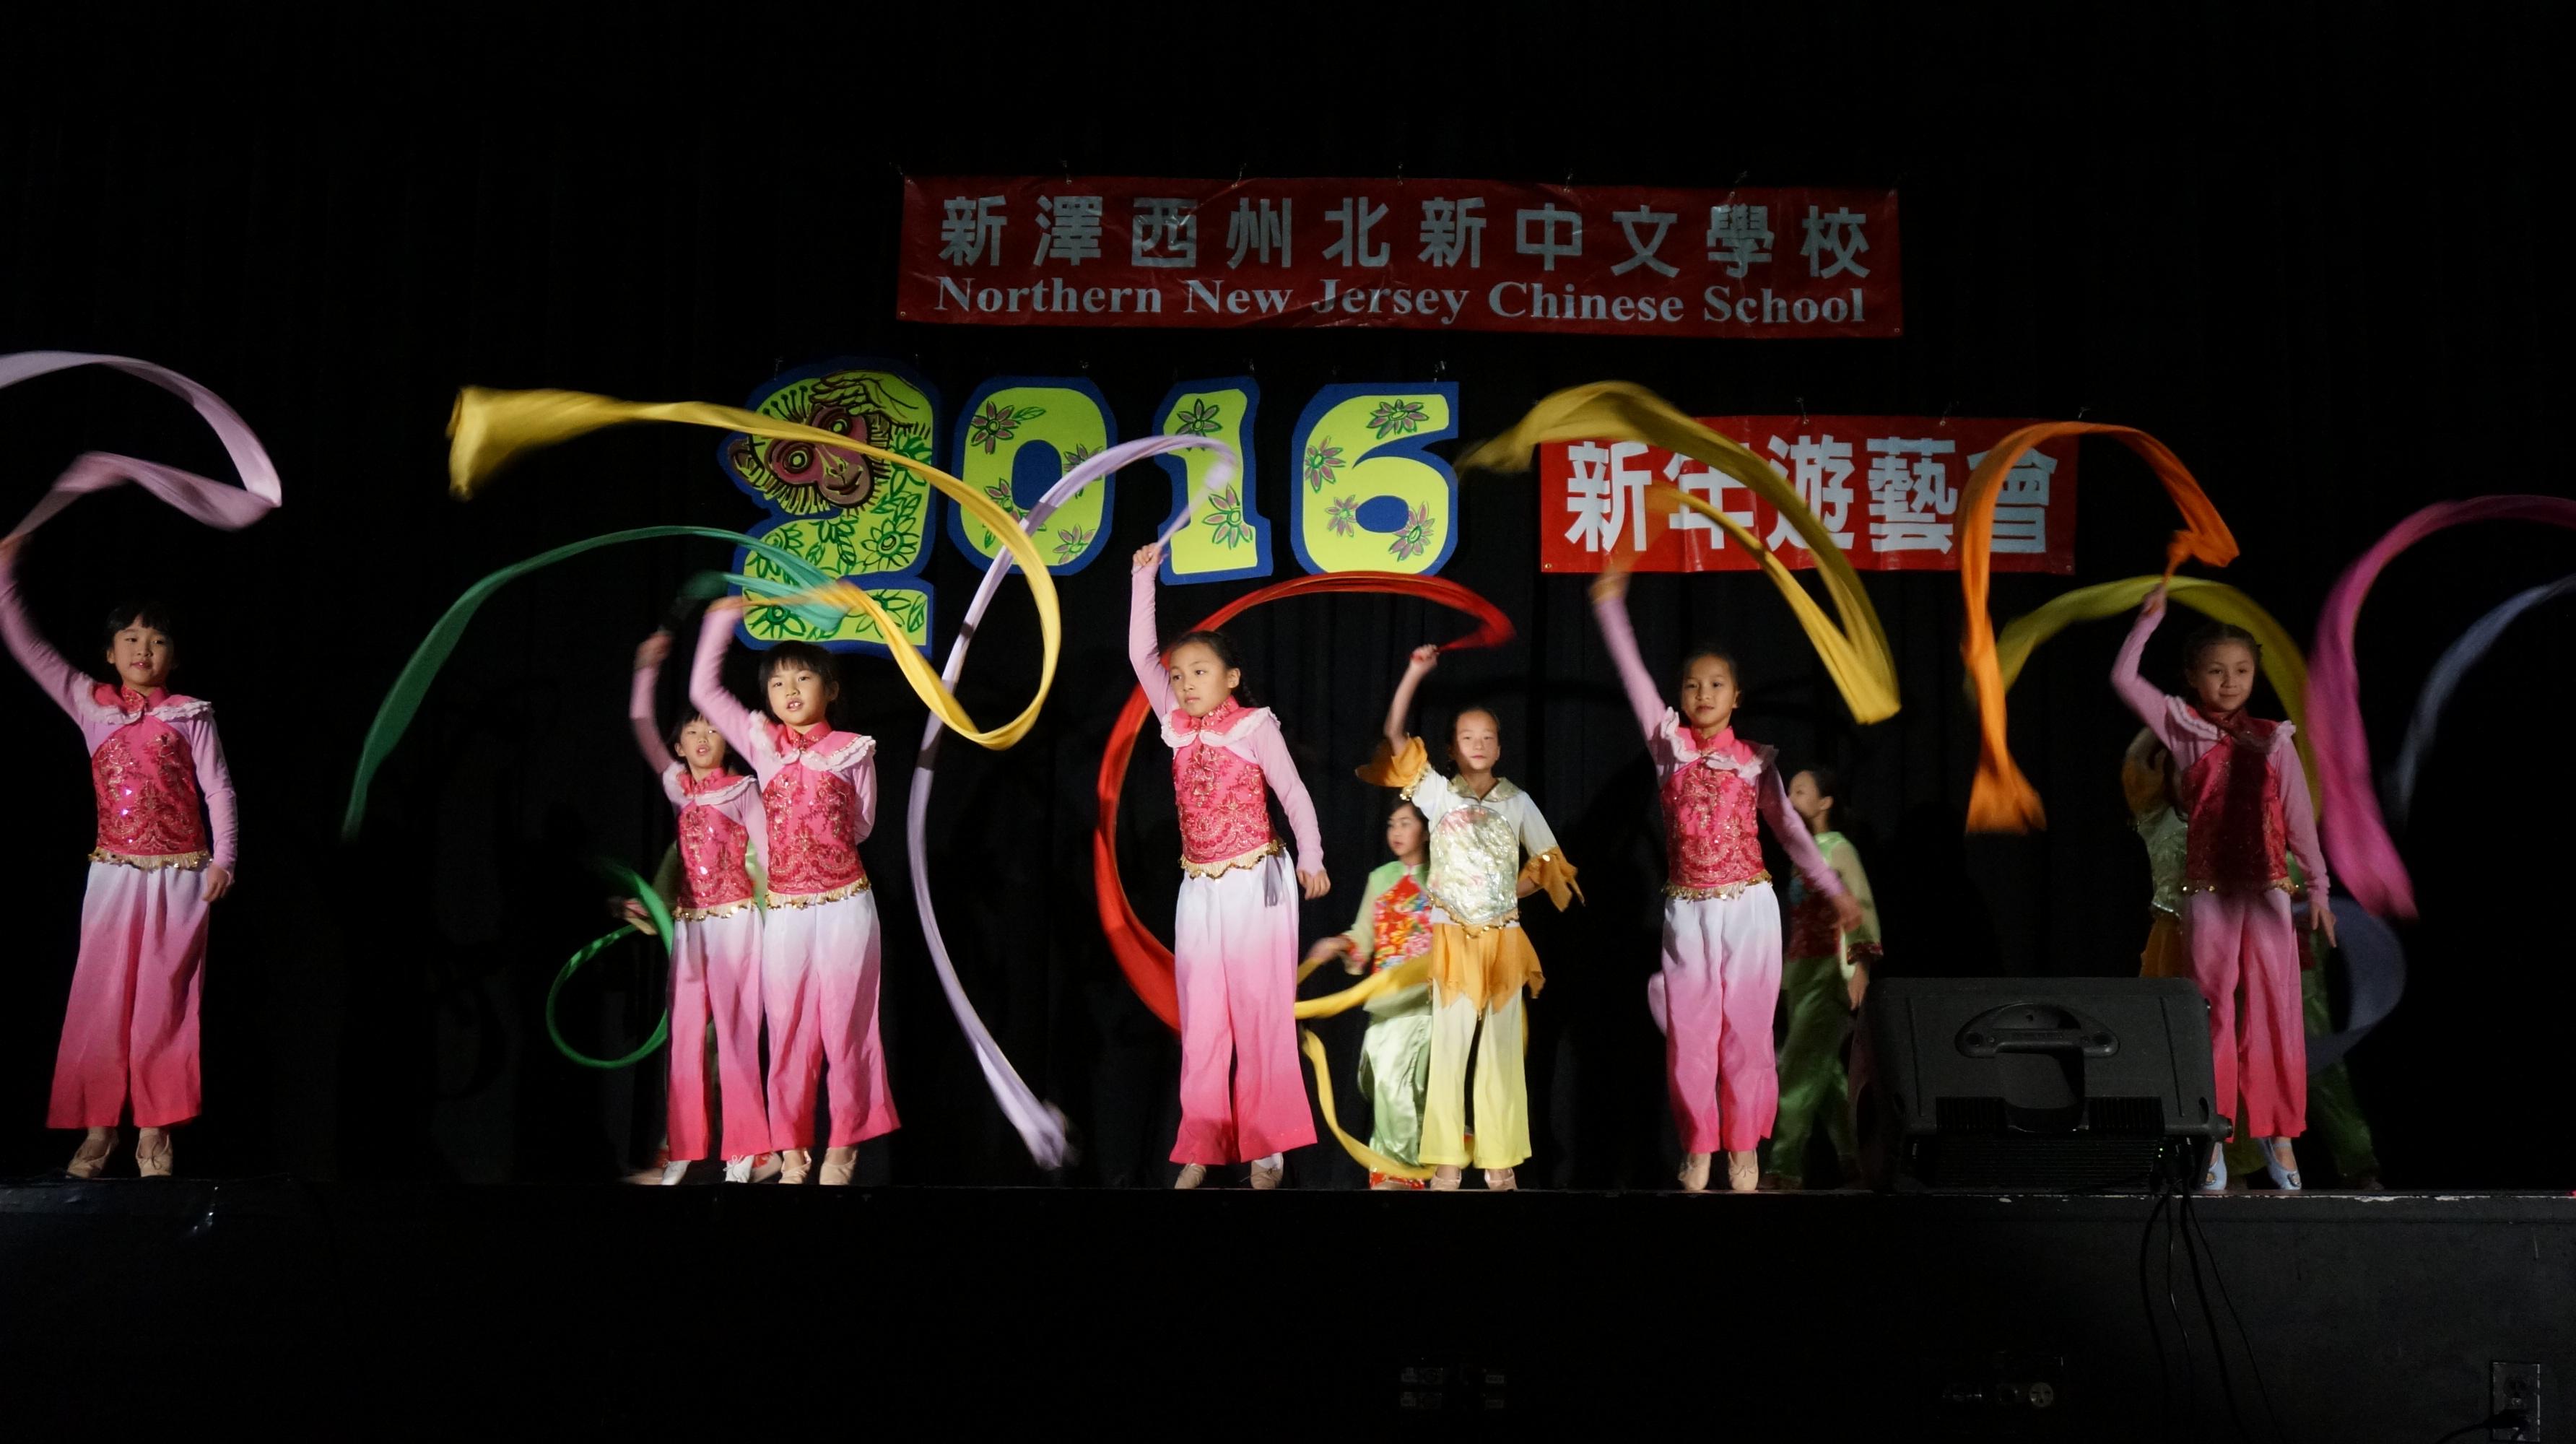 ee81d2c26b1f8c89640c_aaa_Chinese_New_Year_pix_2.JPG